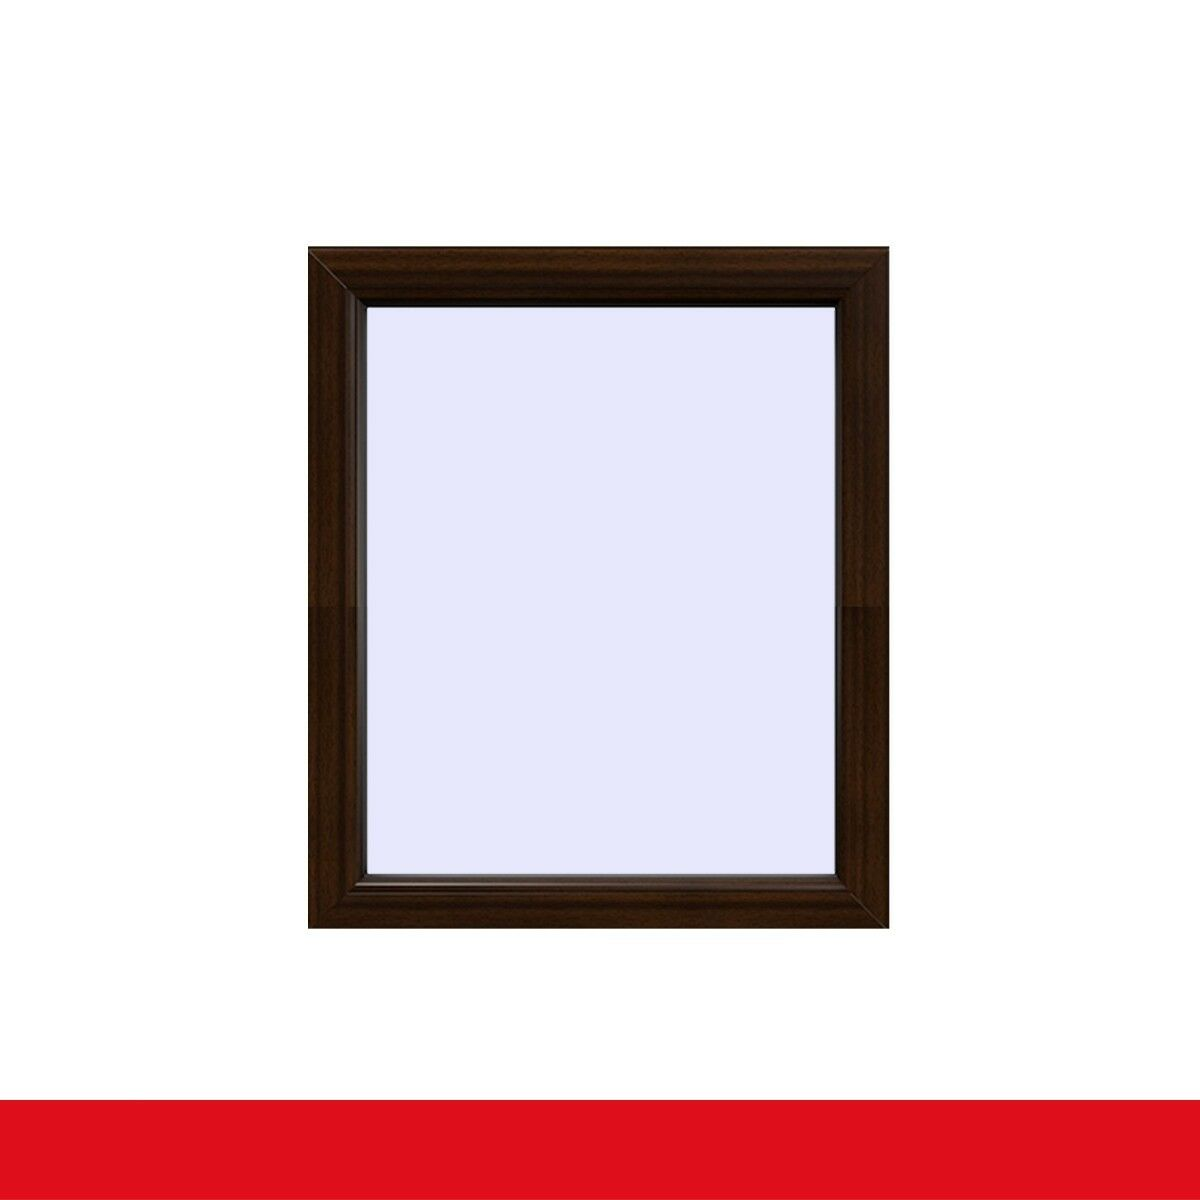 Festverglasung Fenster Mahagoni beidseitig 1 flg. Fest im Rahmen